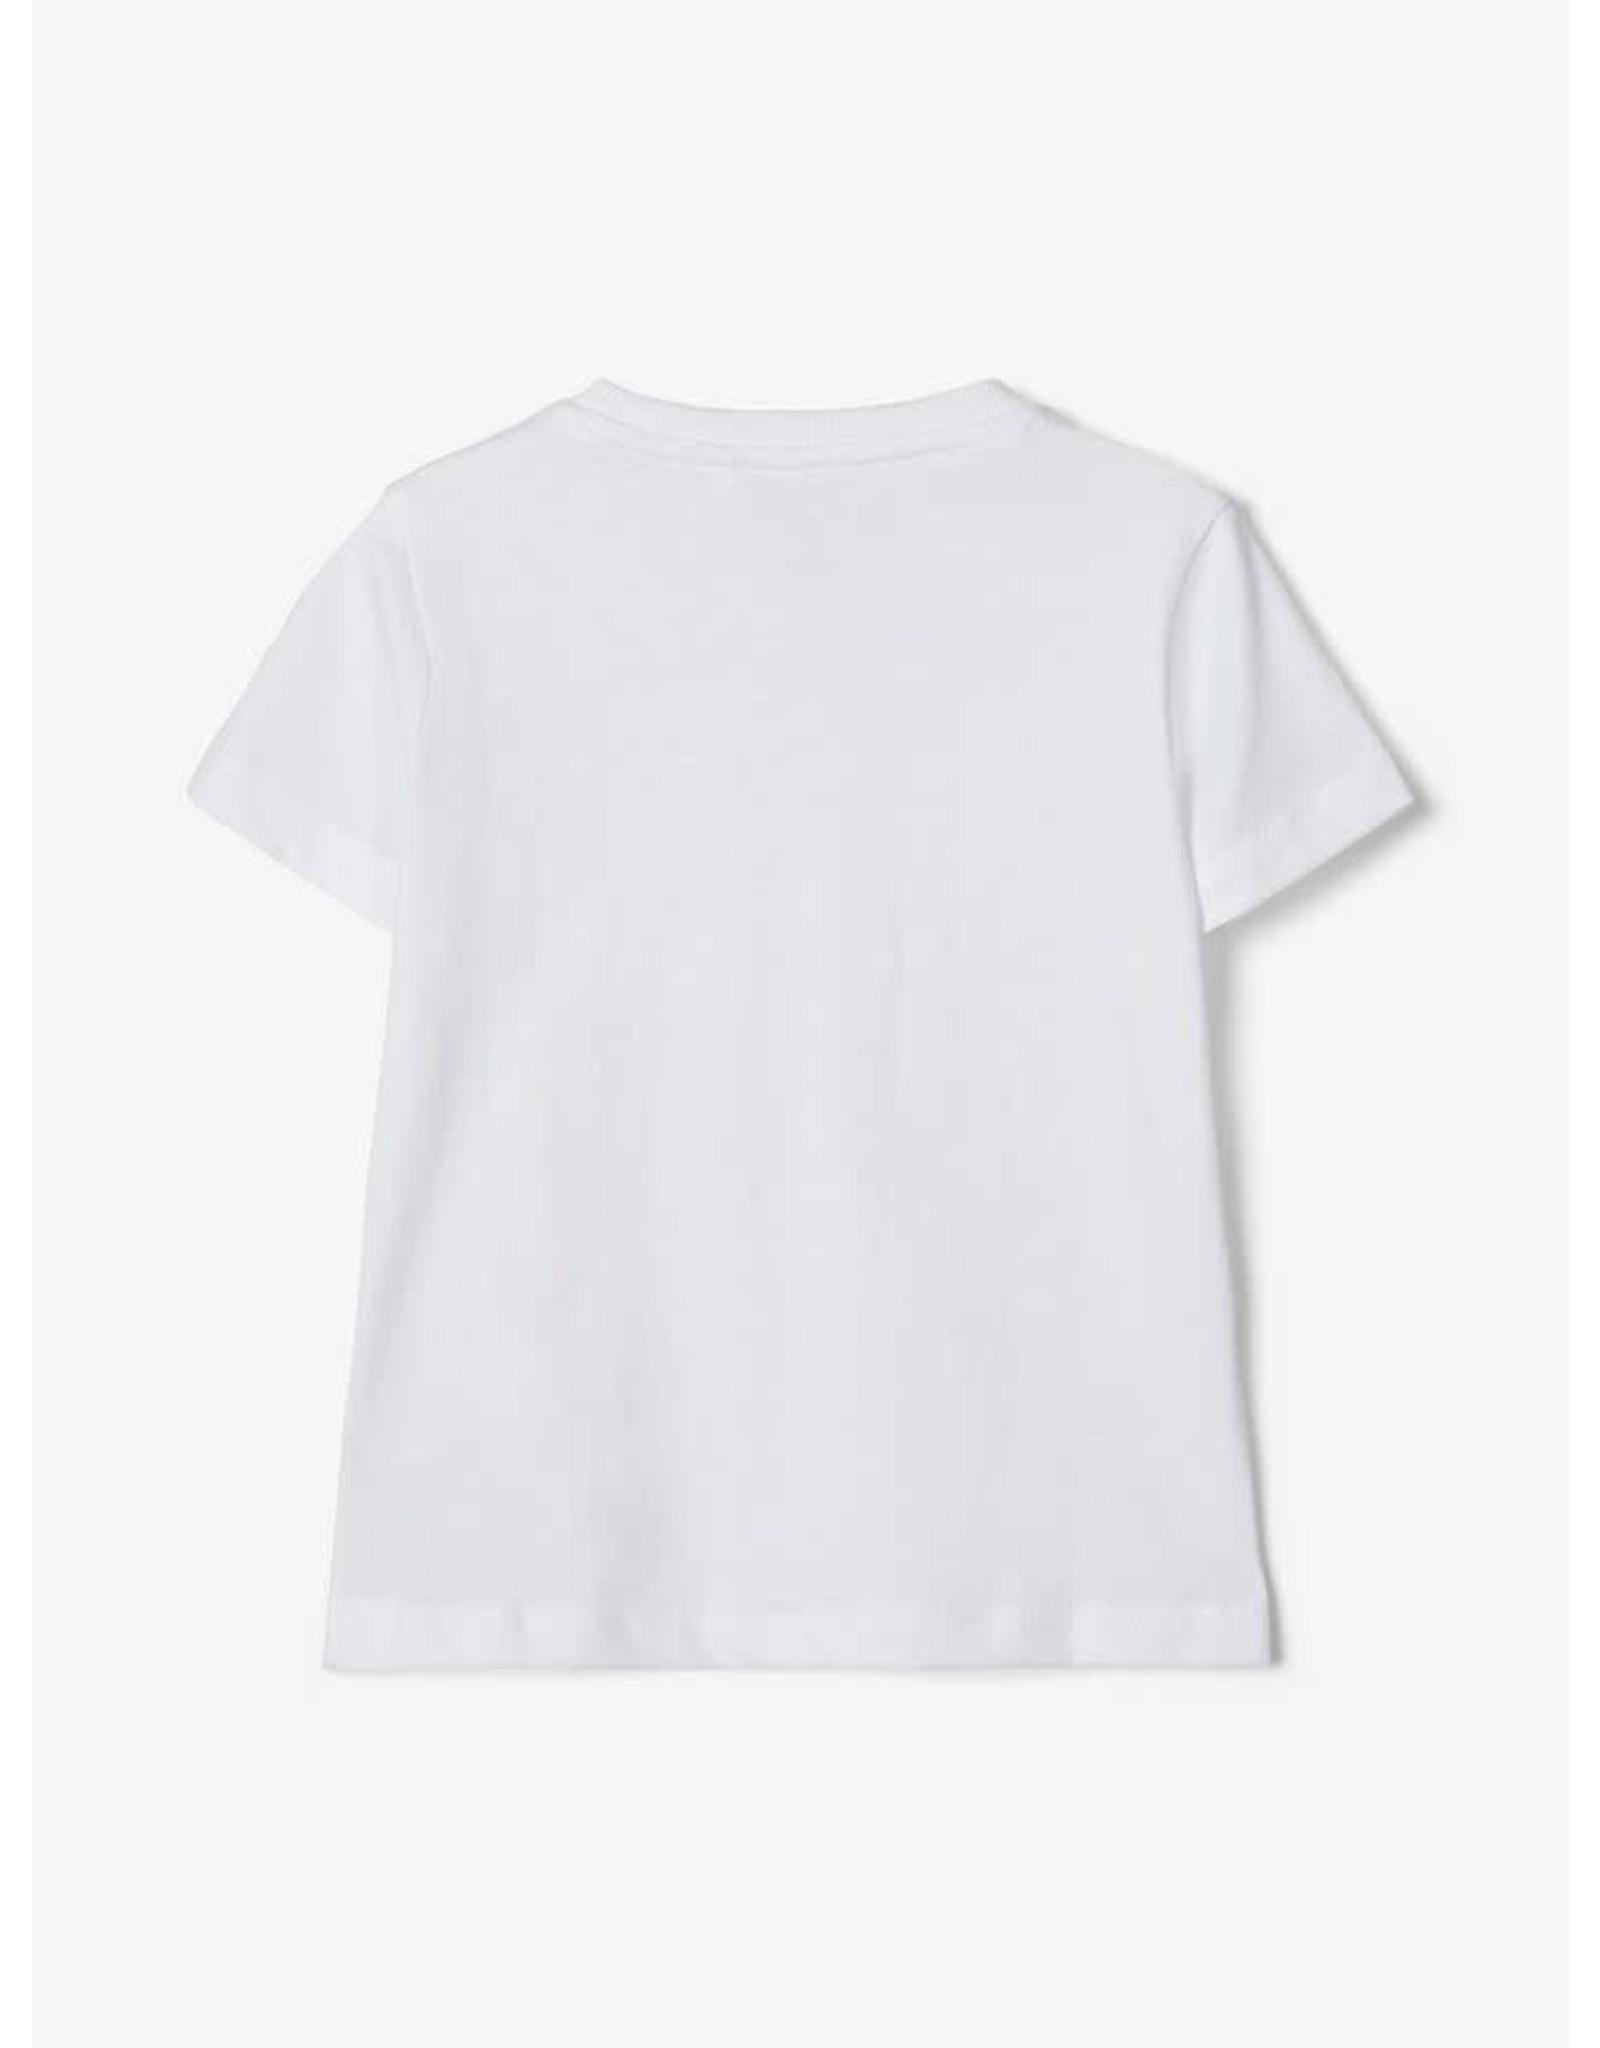 Name It Witte basis t-shirt met borstzakje